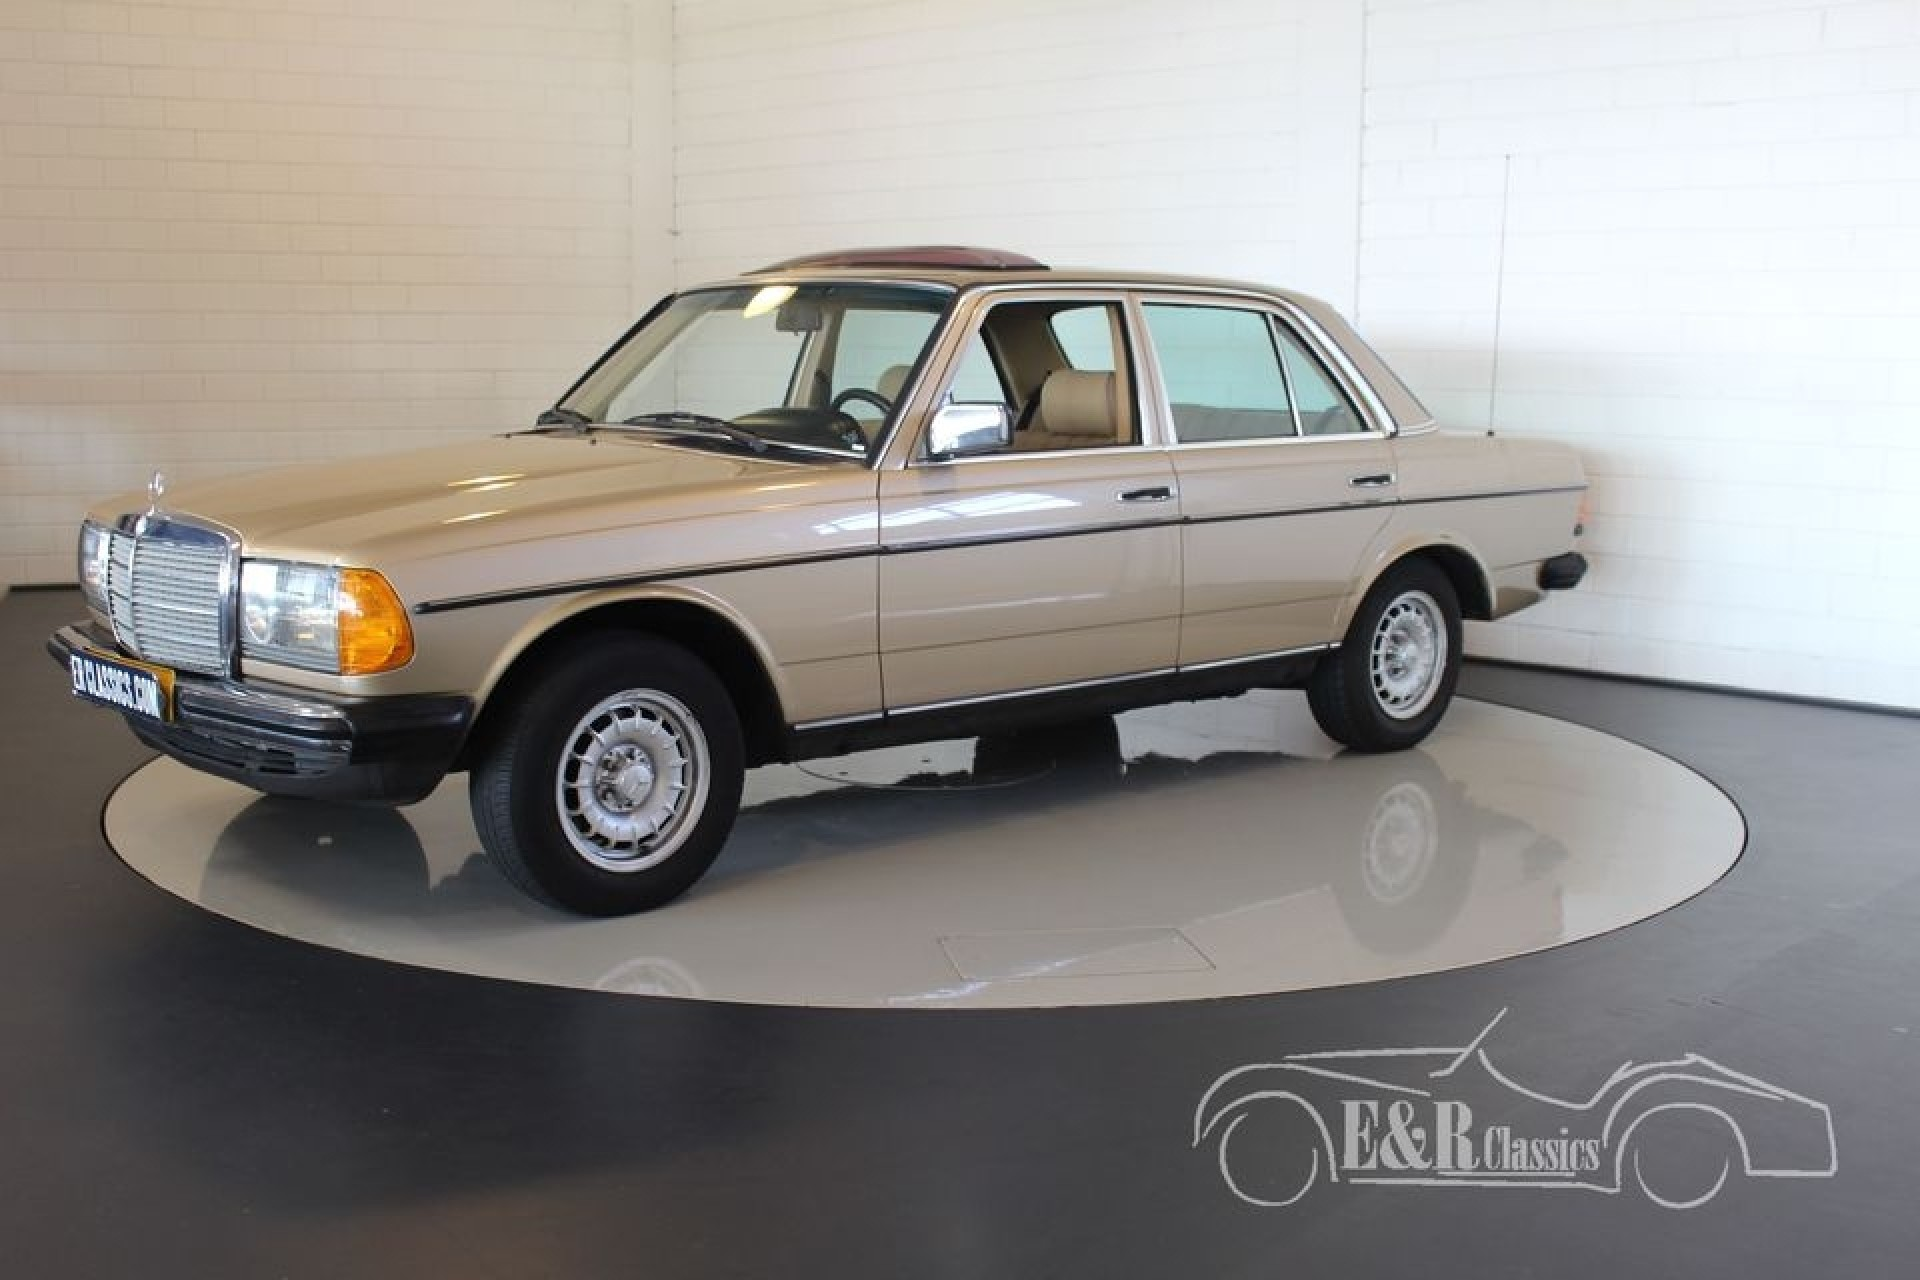 Mercedes benz 230e 1984 for sale at erclassics for 1984 mercedes benz